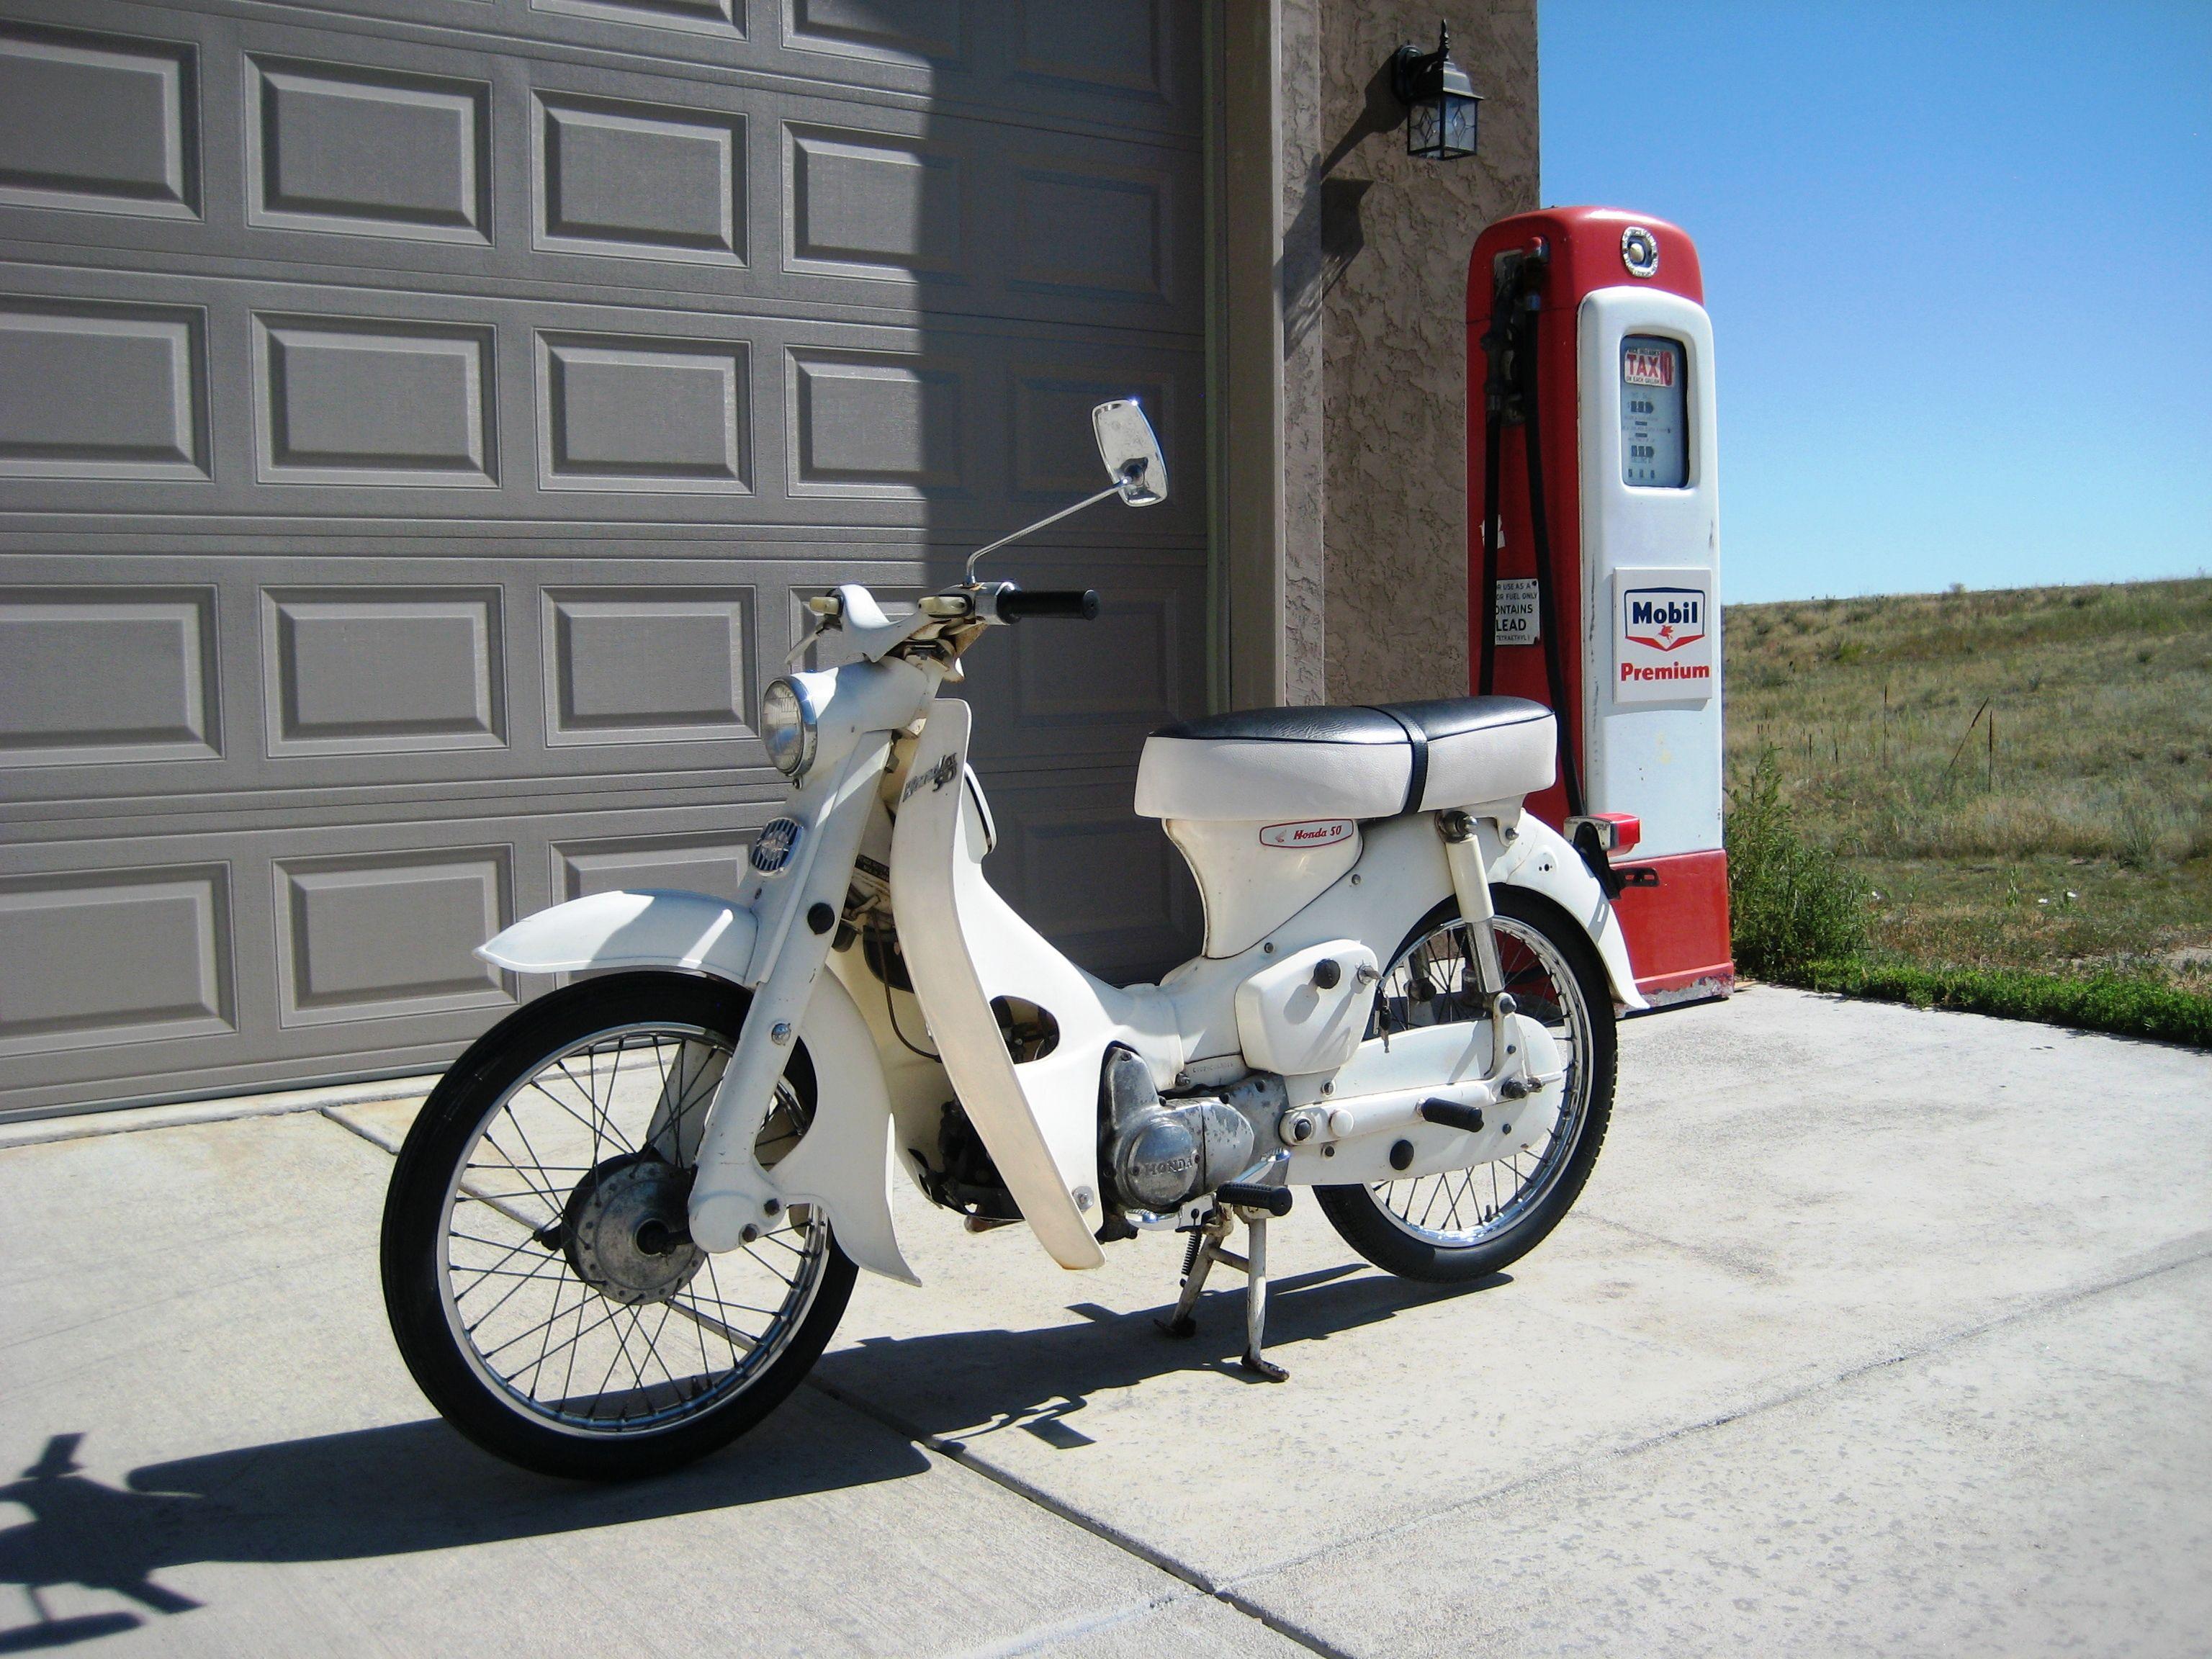 1965 Honda C102 50cc OHV Engine with 3spd Auto-Clutch